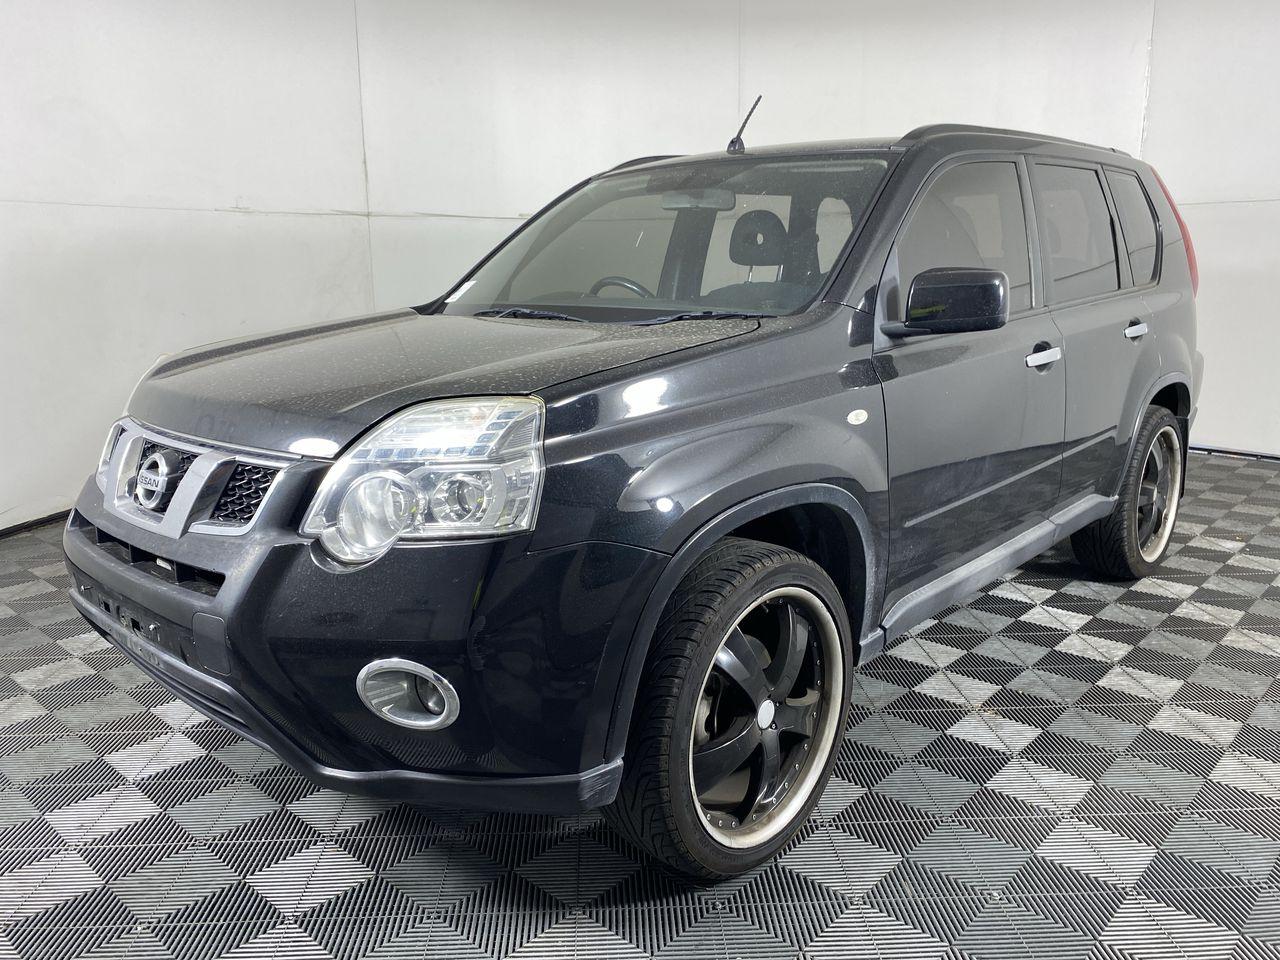 2012 Nissan X-Trail ST (FWD) T31 SUV 128,875 km's (WOVR+Inspected)